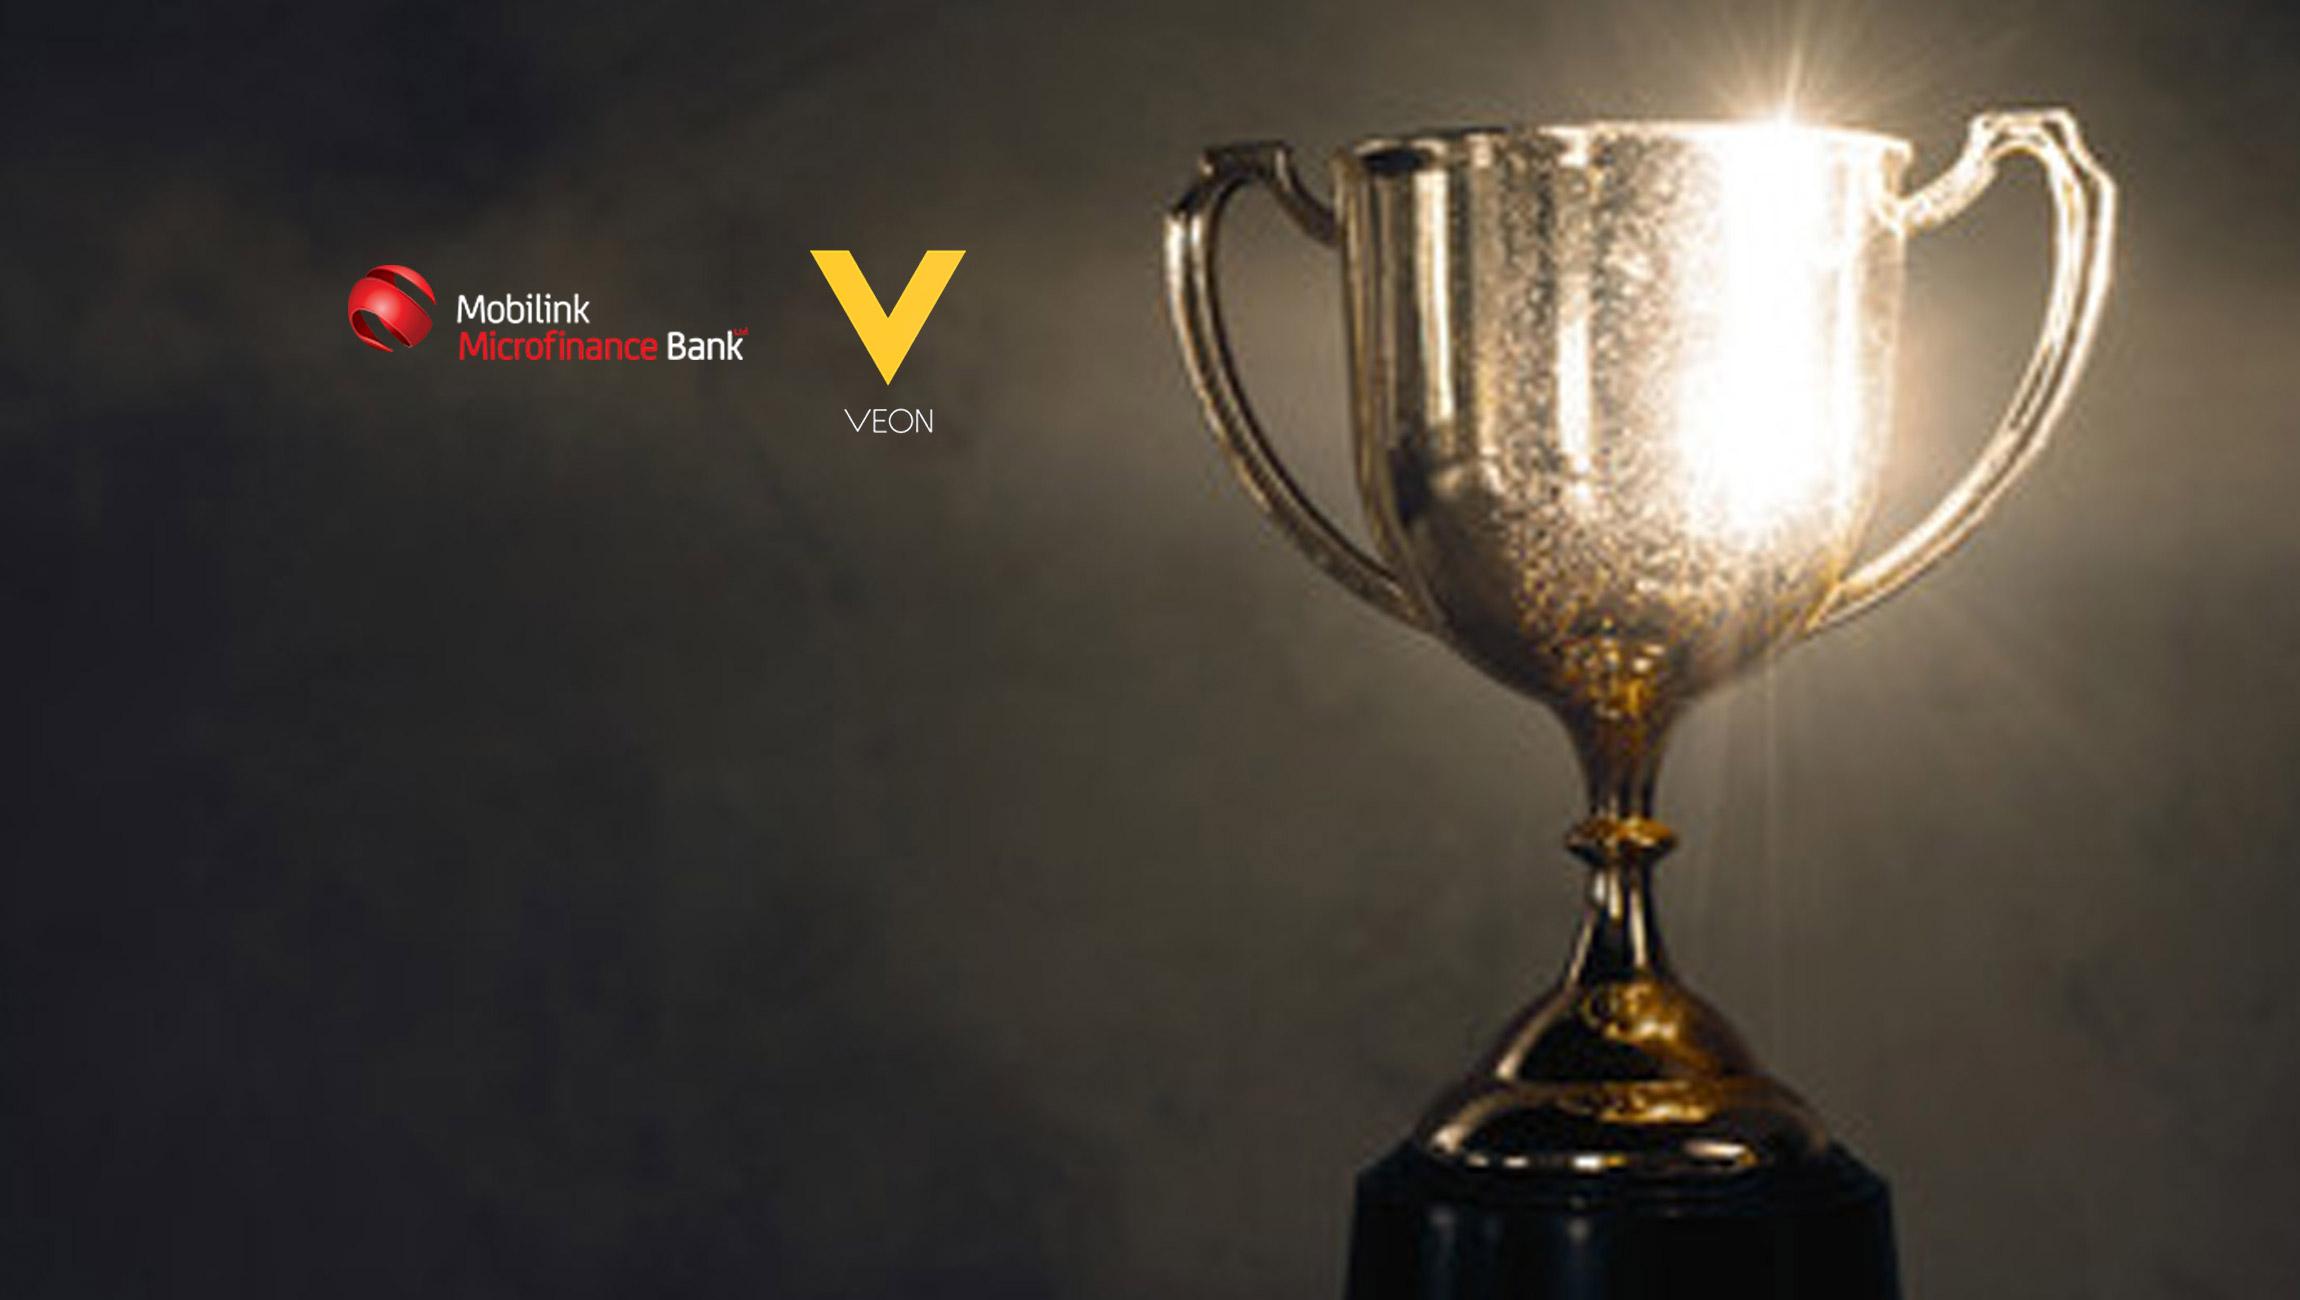 VEON's Mobilink Microfinance Bank Wins Prestigious Diversity & Inclusion CSR Award